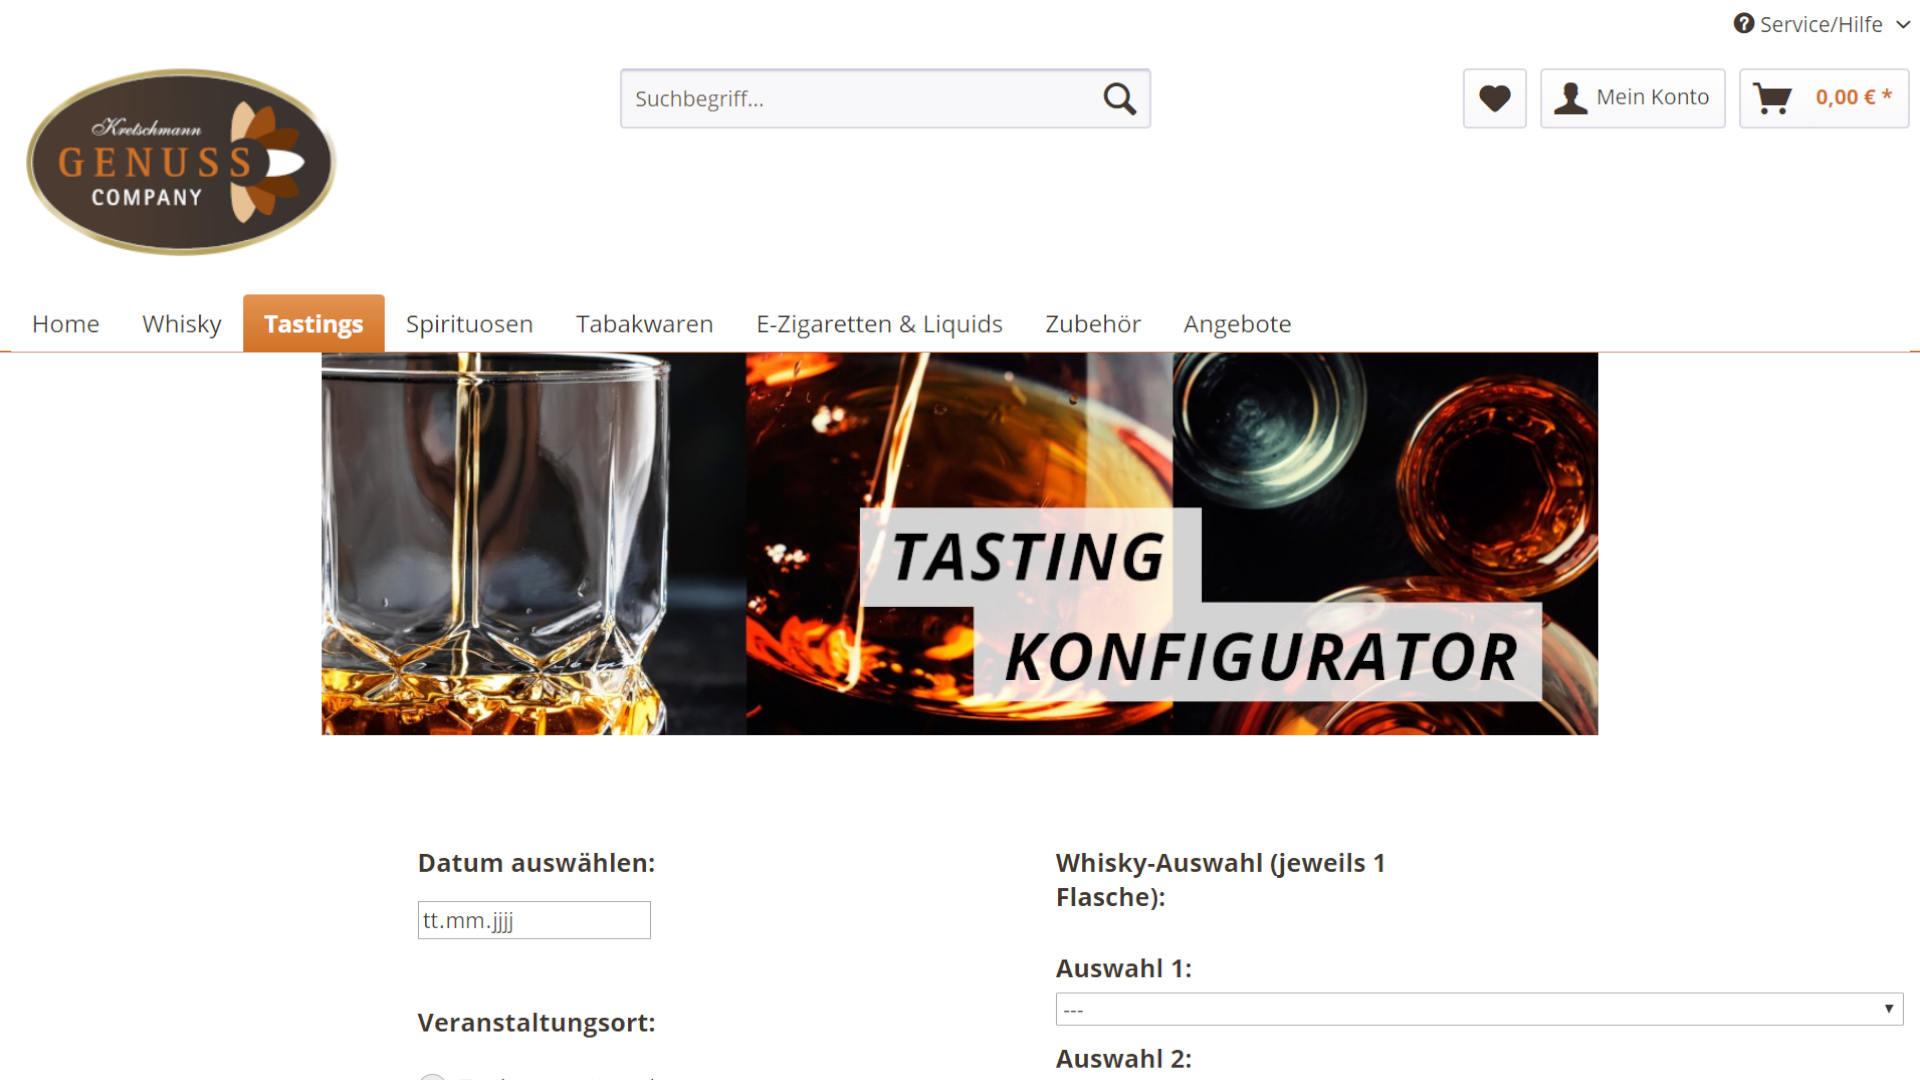 Screenshot: Kretschmann24 Webshop mit Tasting-Konfigurator